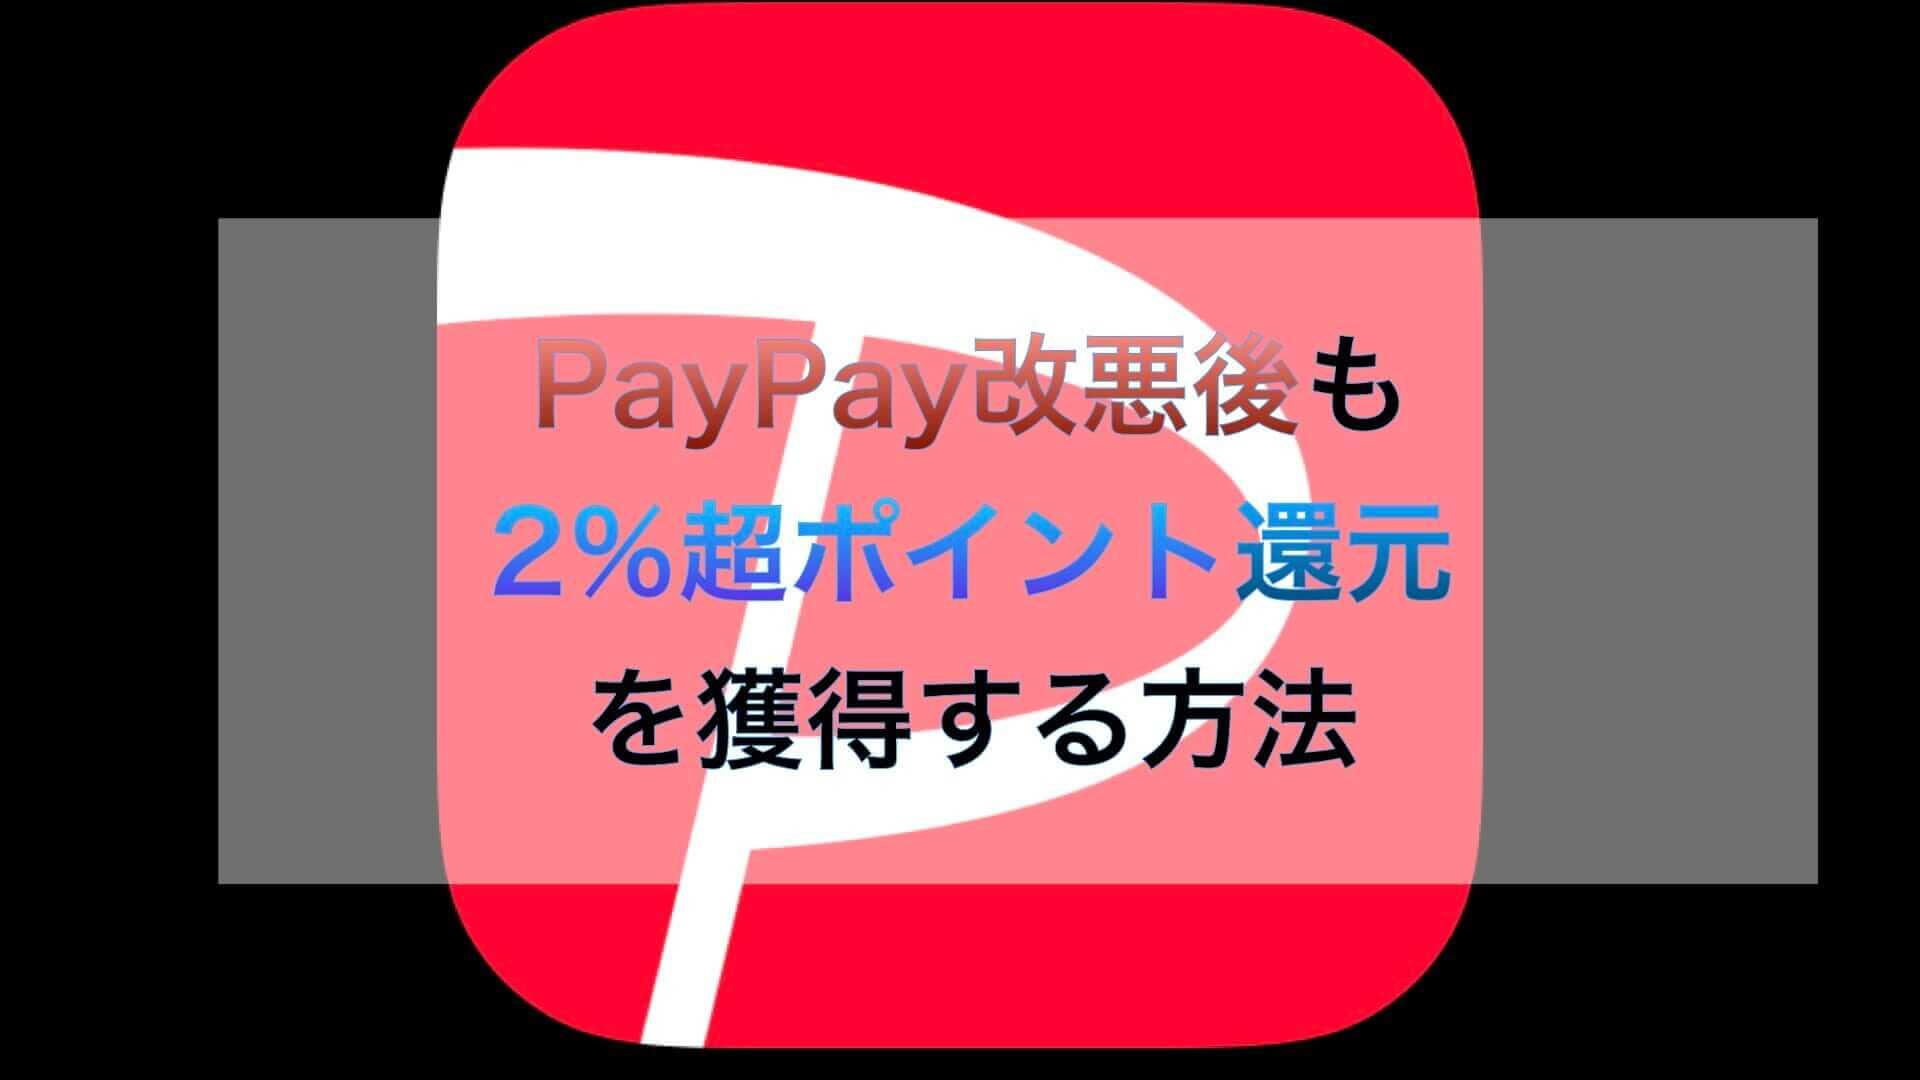 PayPay還元率悪化後も使い続けるべき?|PayPayで2%超のポイント還元方法